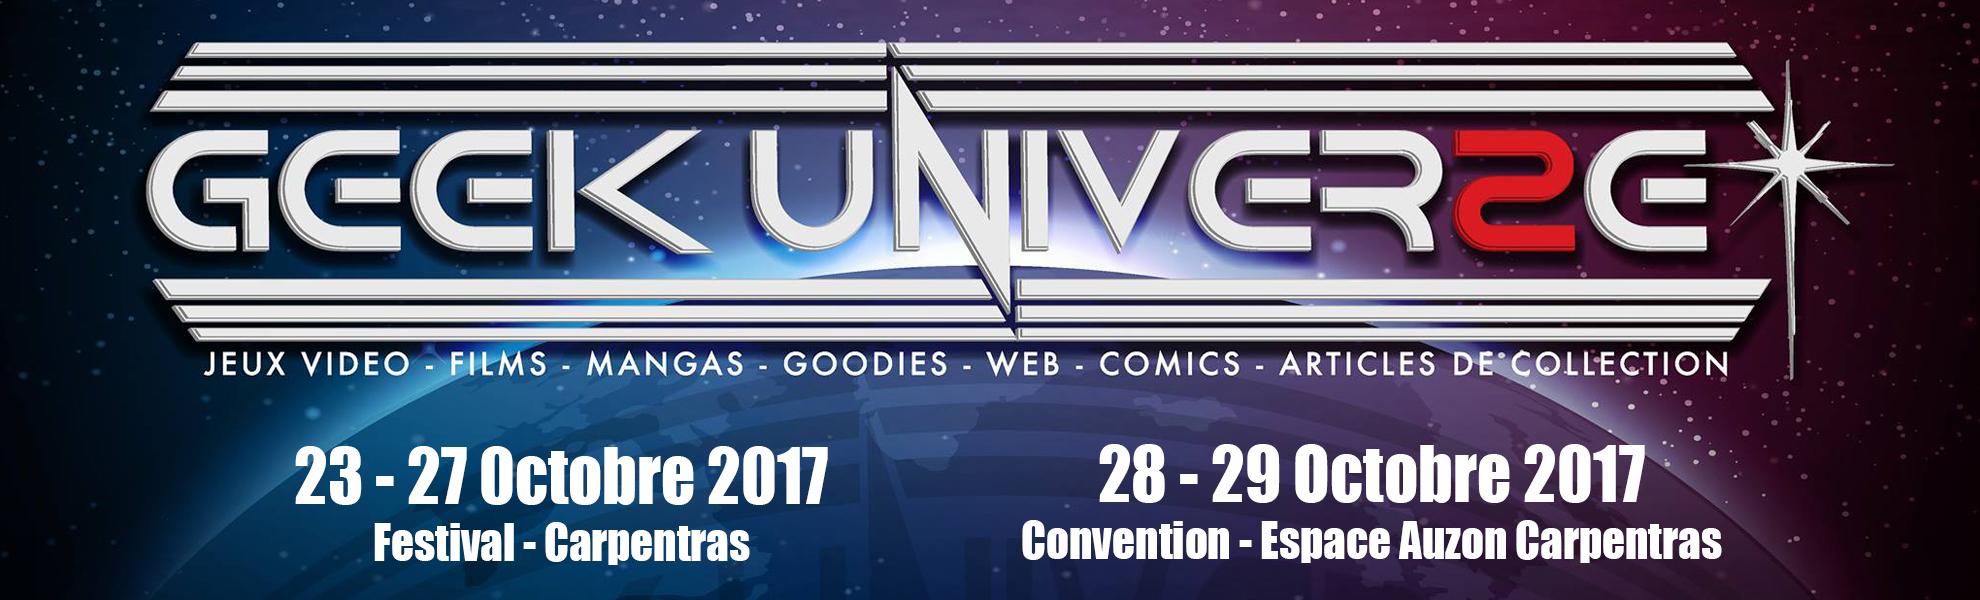 Banderole-Geek-Universe-2